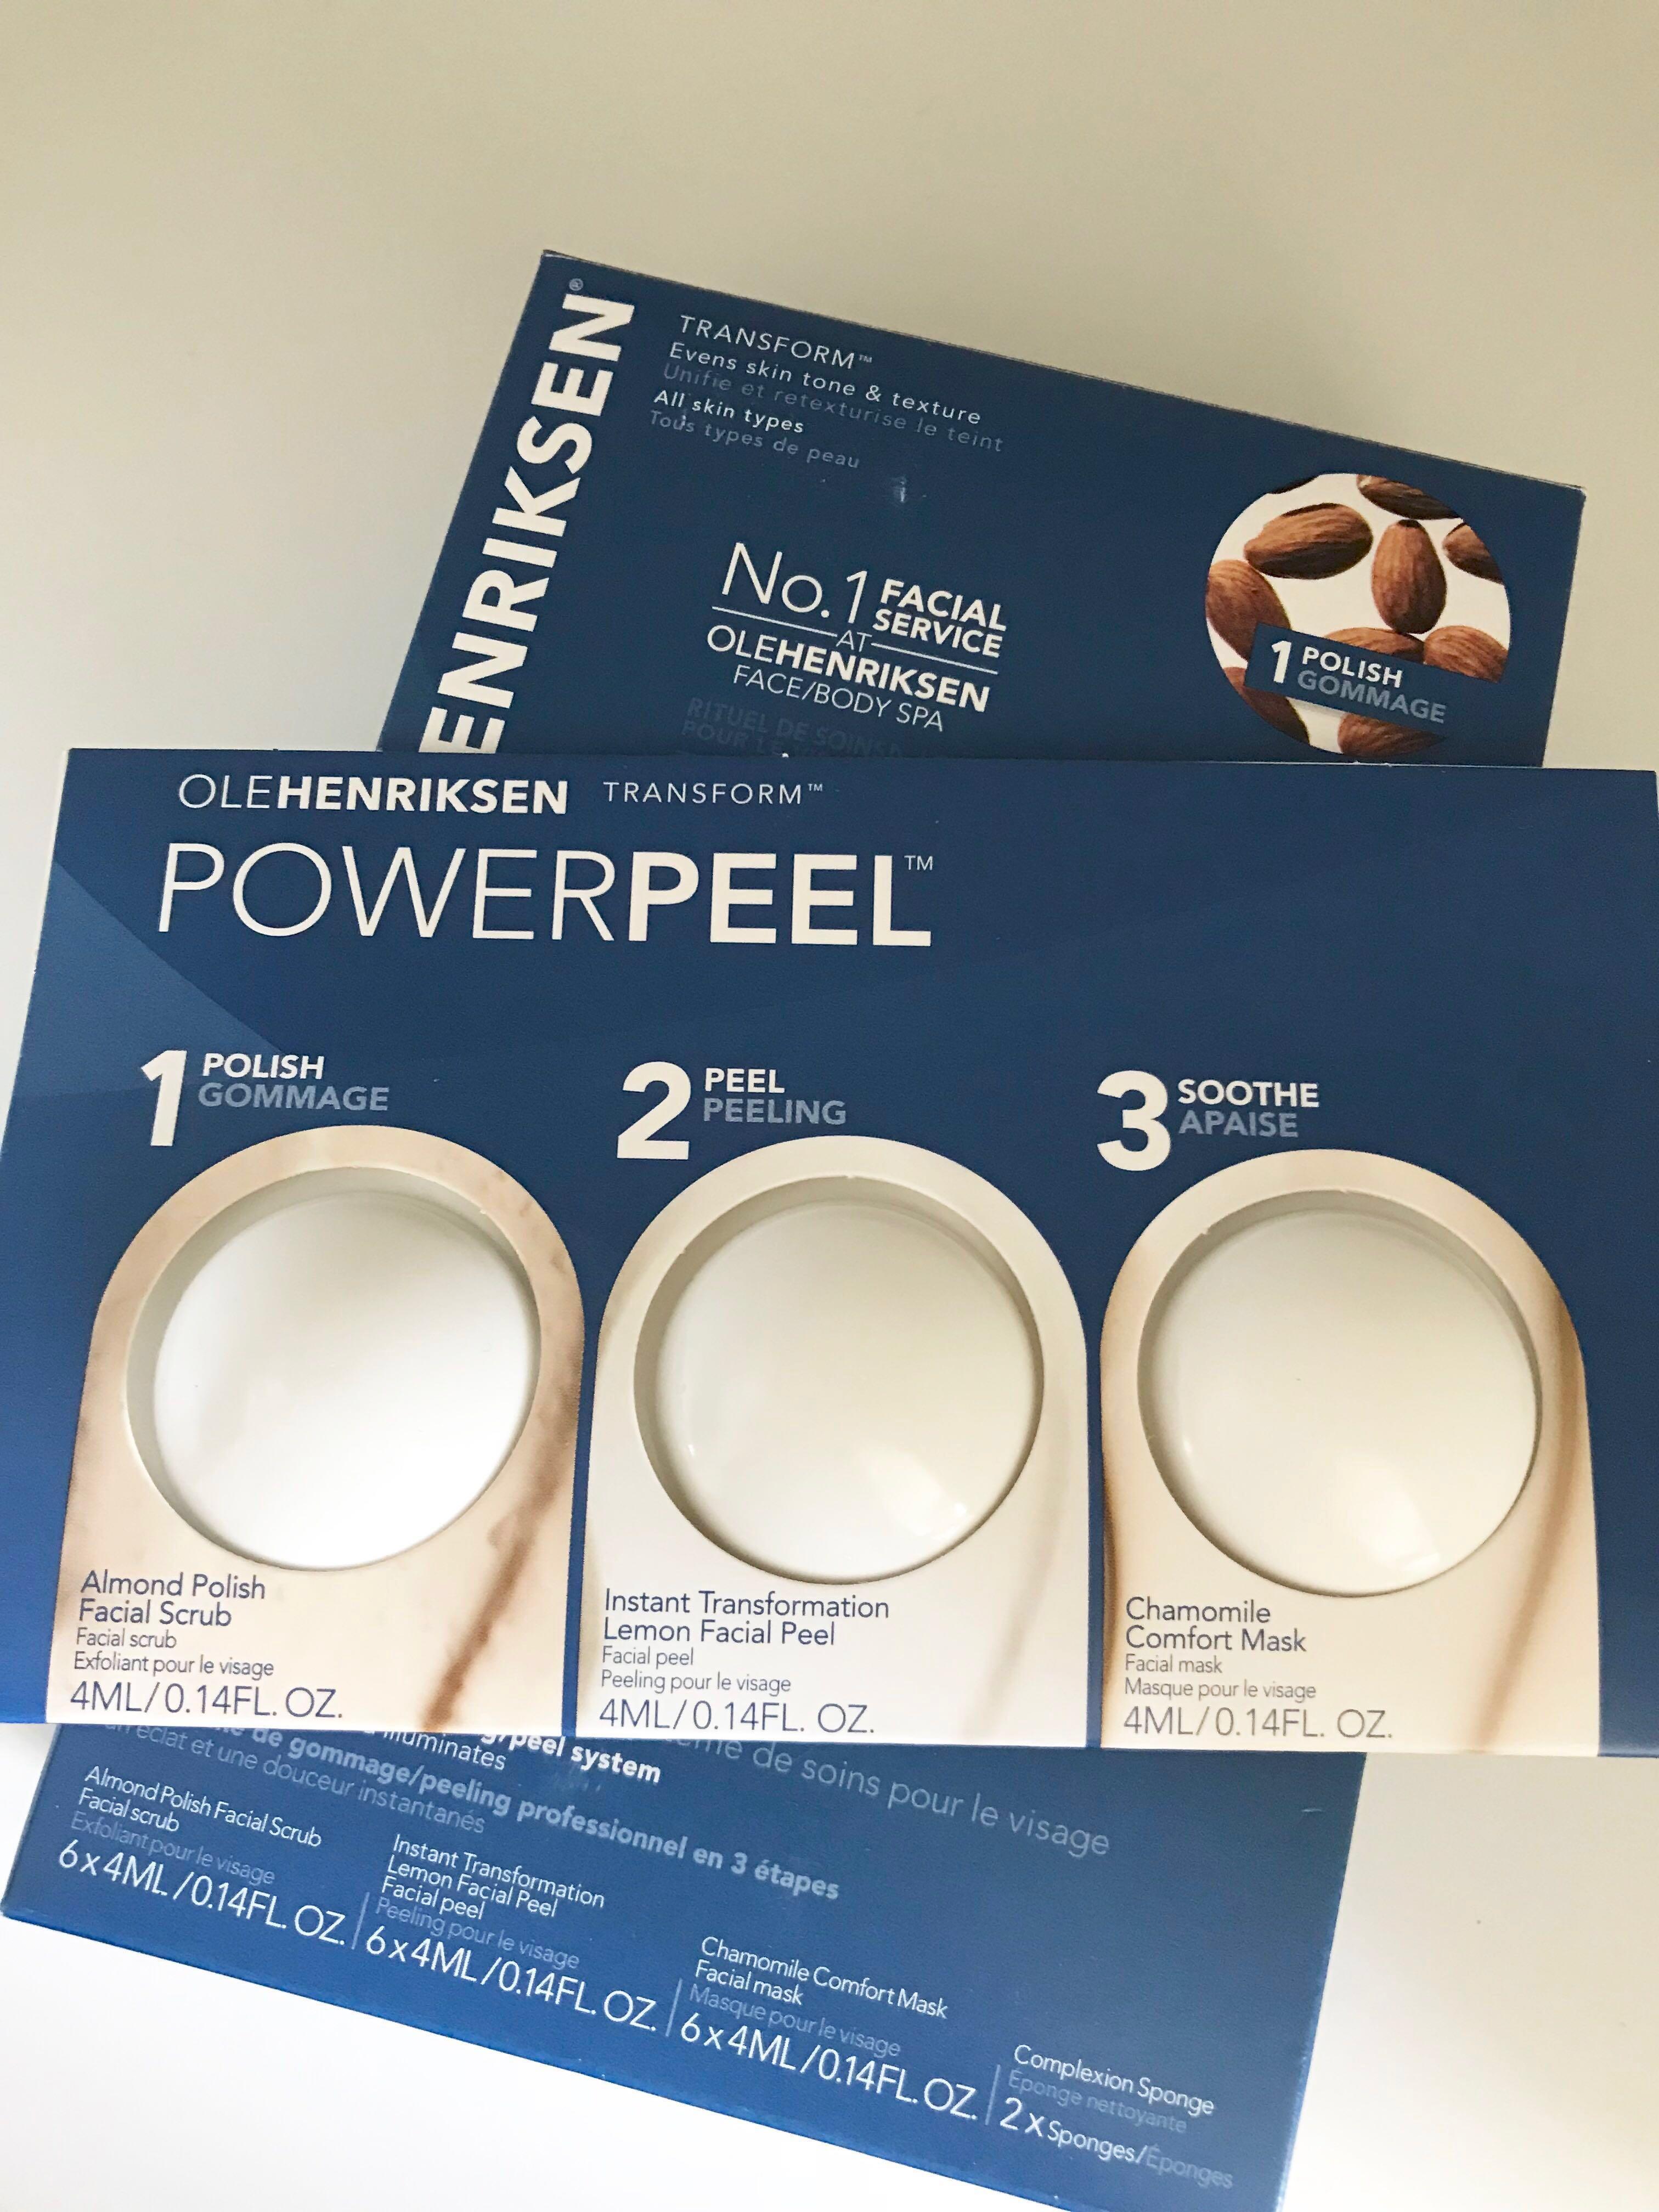 Sephora - Ole Henriksen Power Peel Transforming Facial System